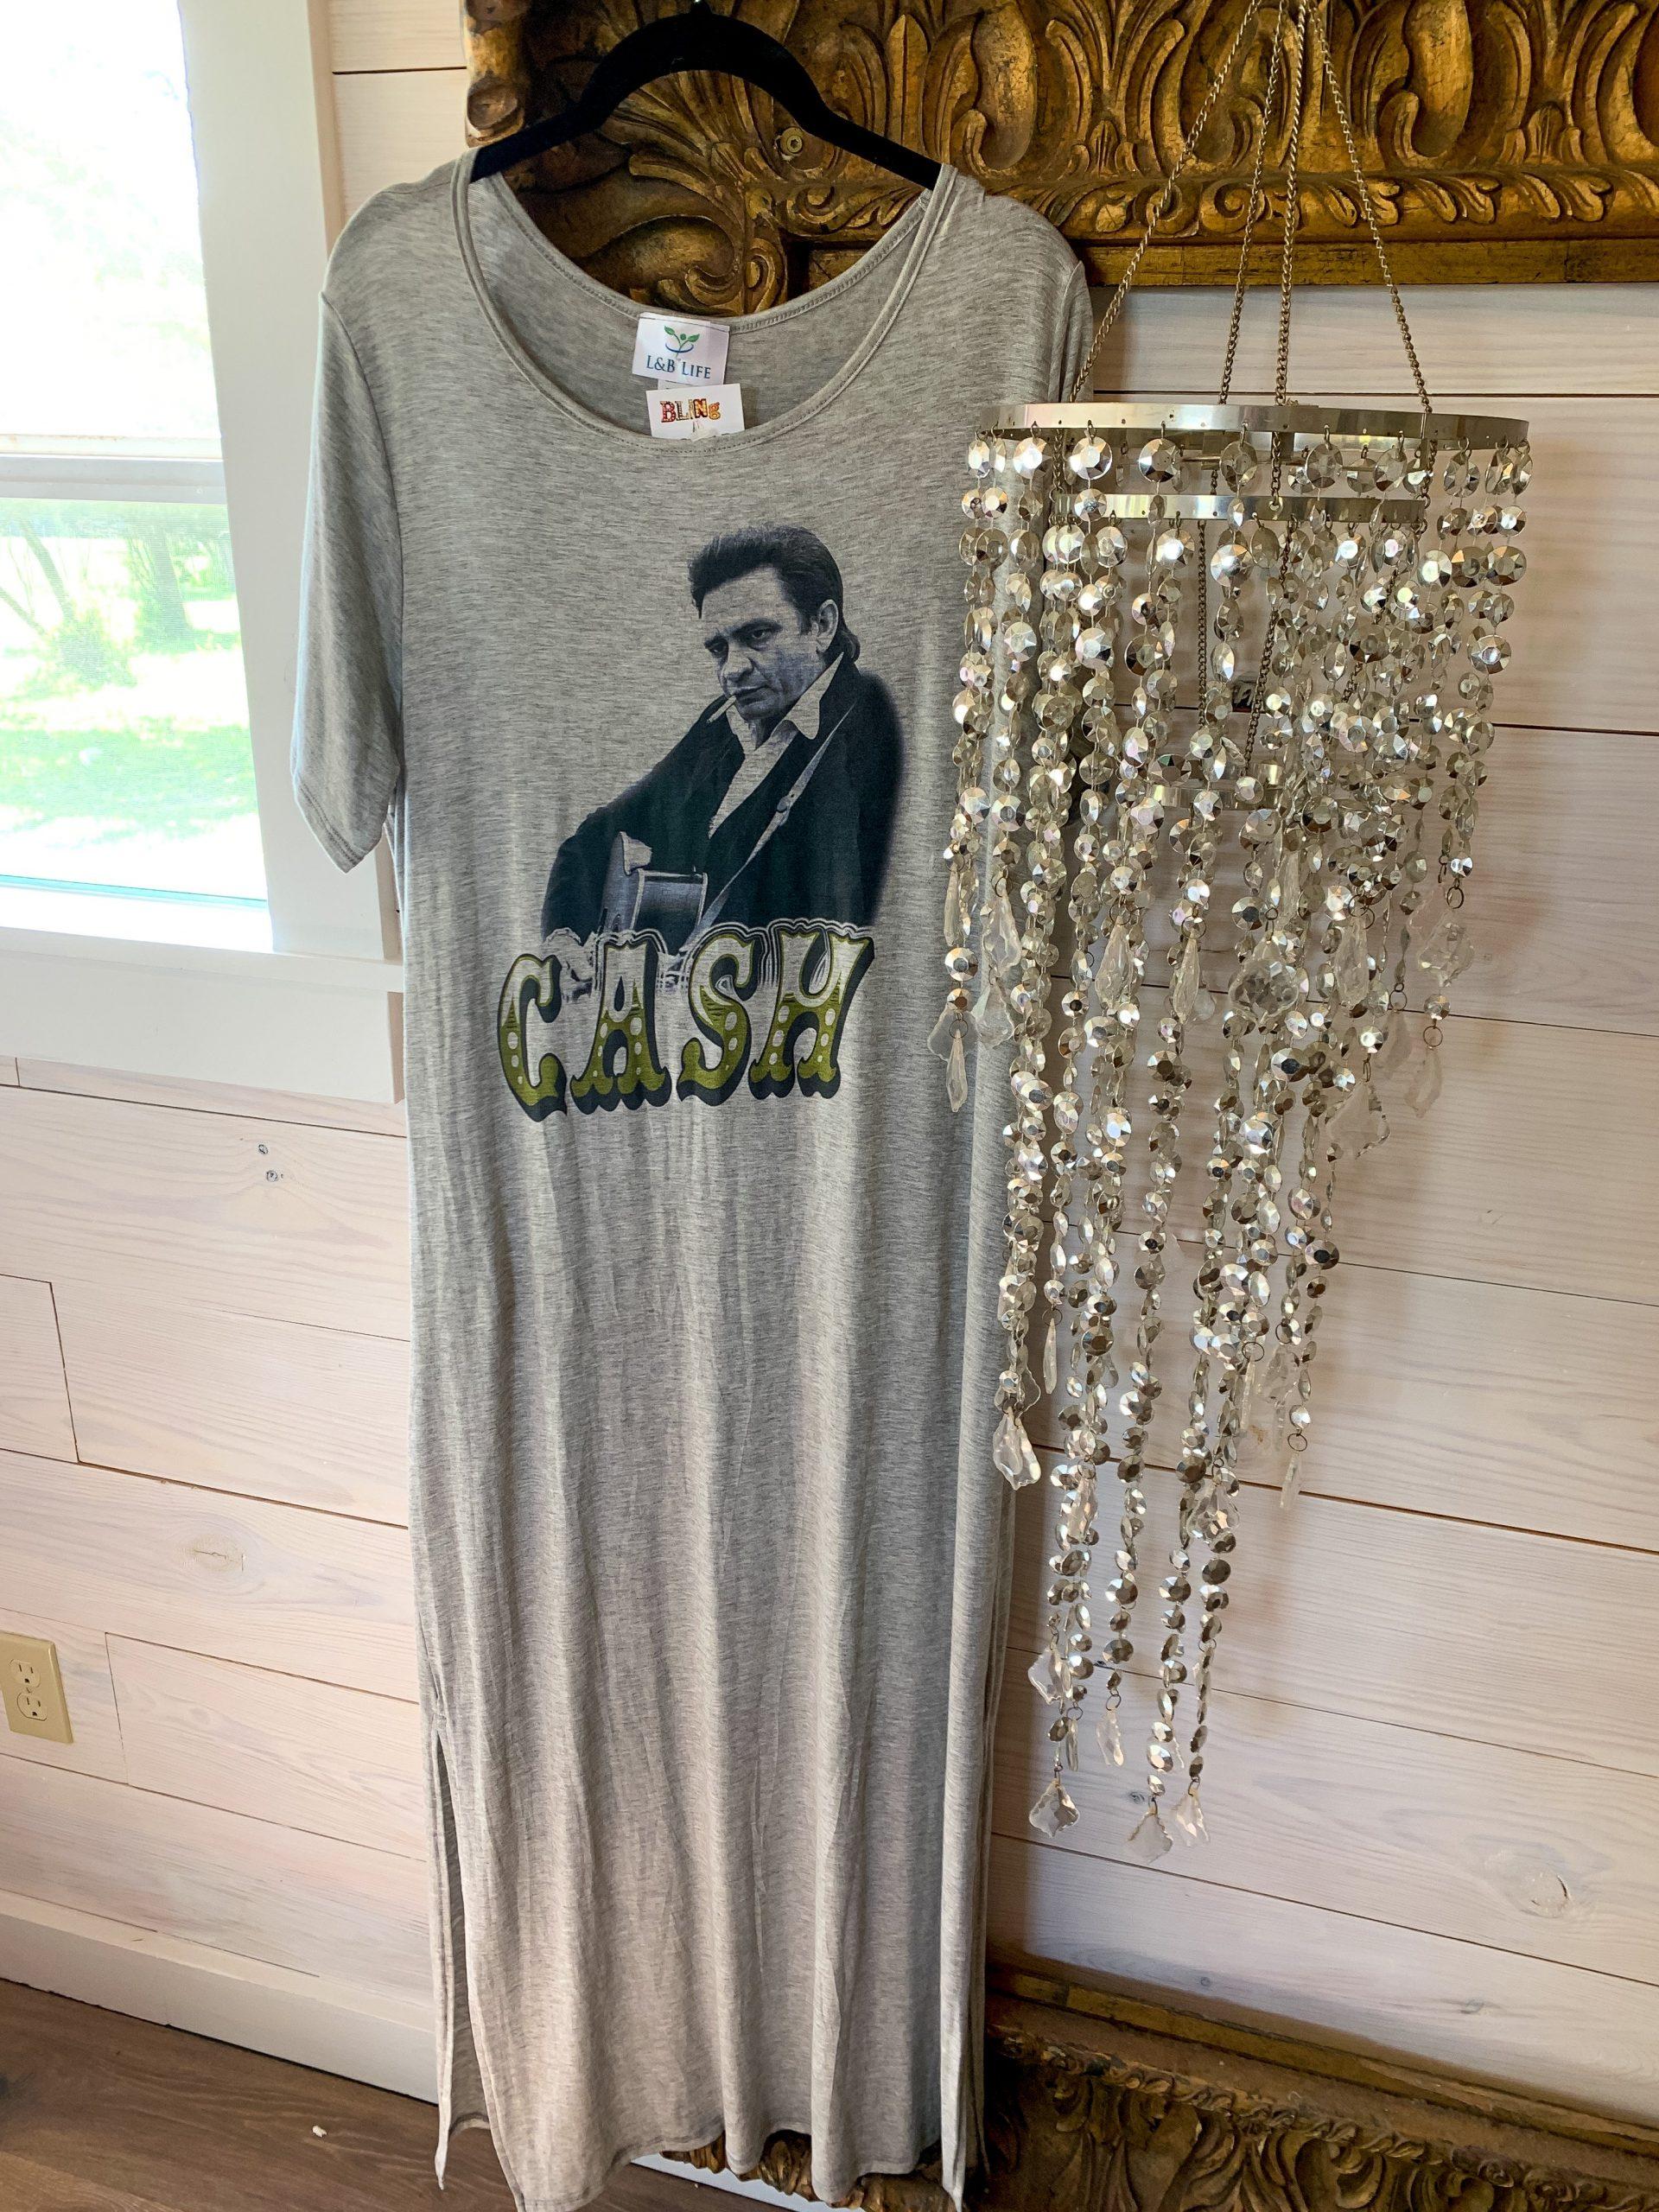 Johnny Cash on Gray Tshirt  Dress